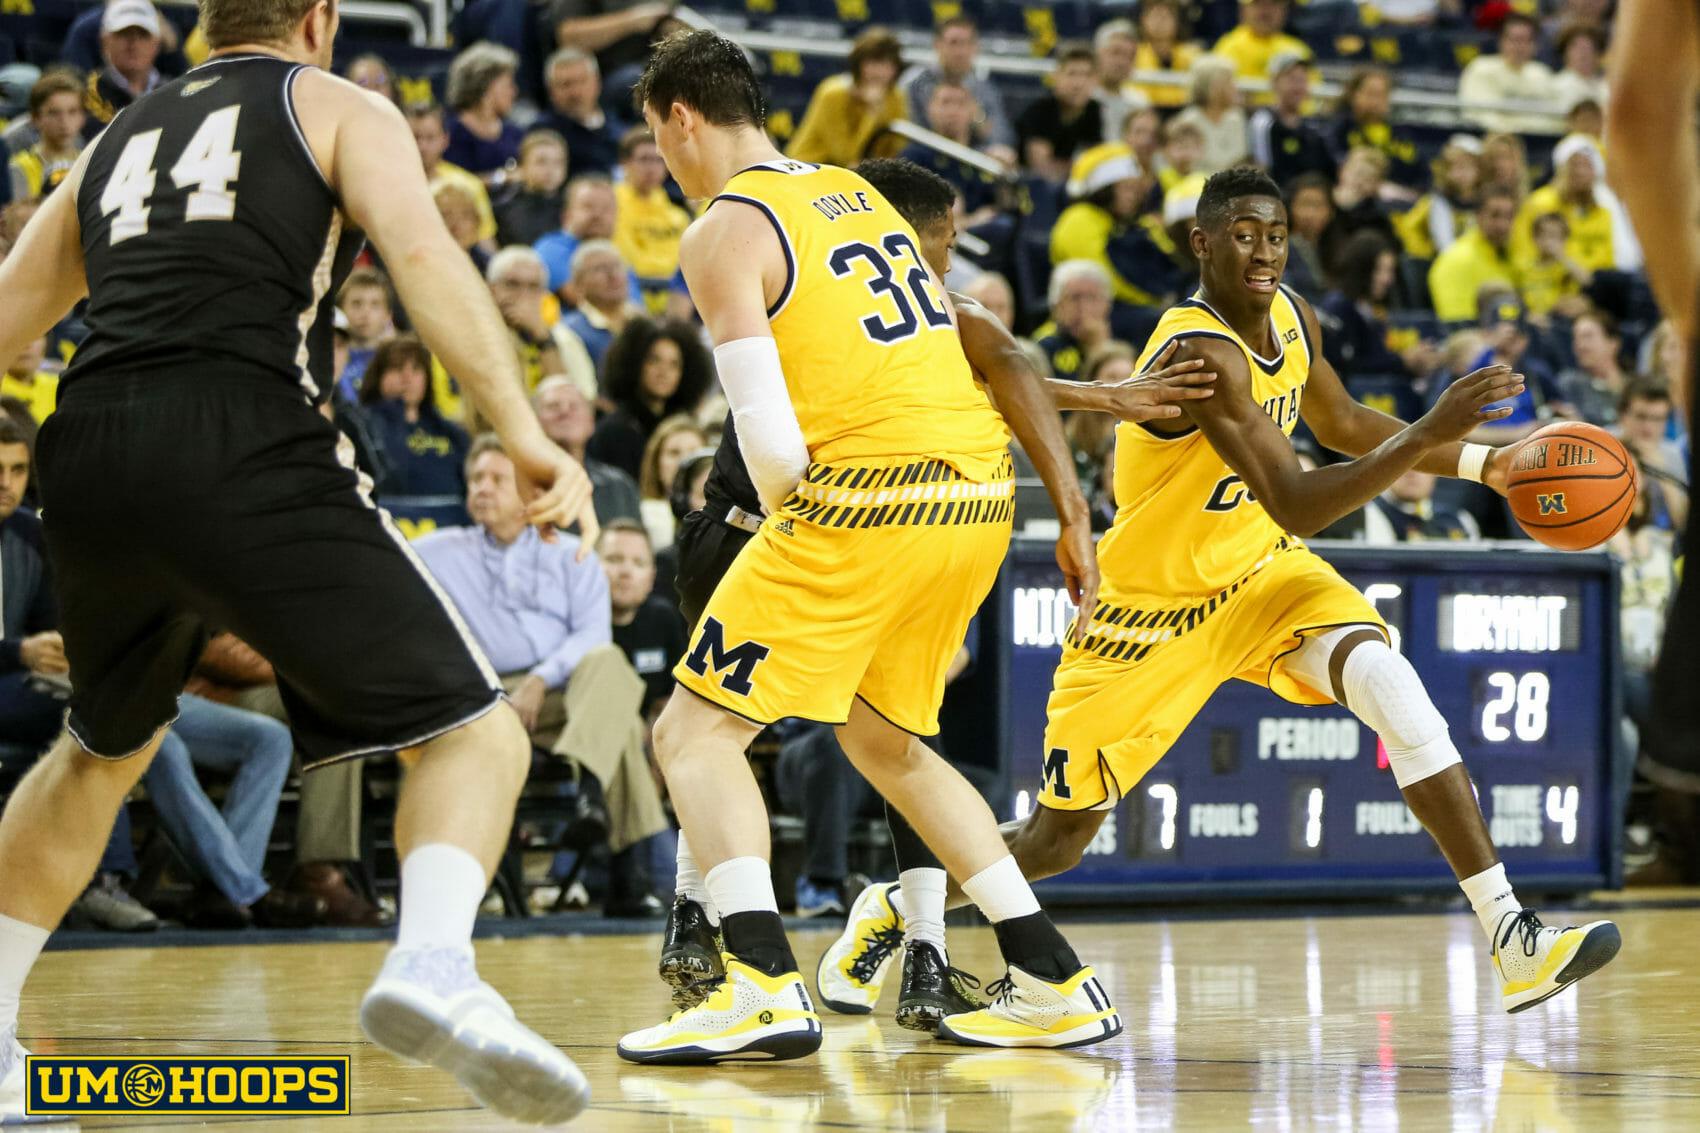 Michigan 96, Bryant 60-14